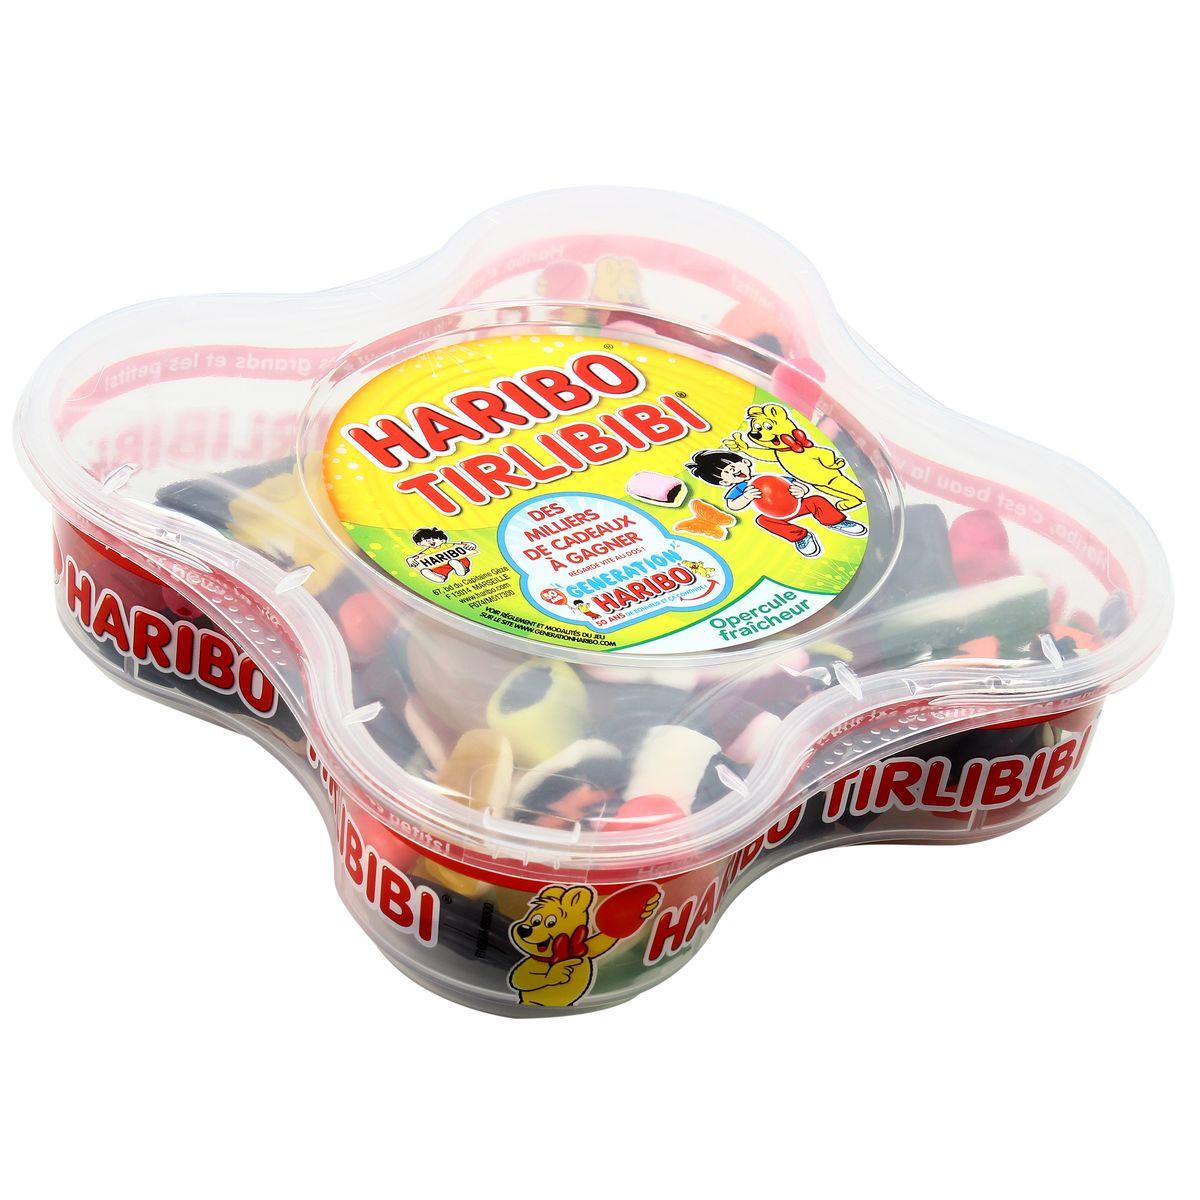 goters gourmands avec haribo